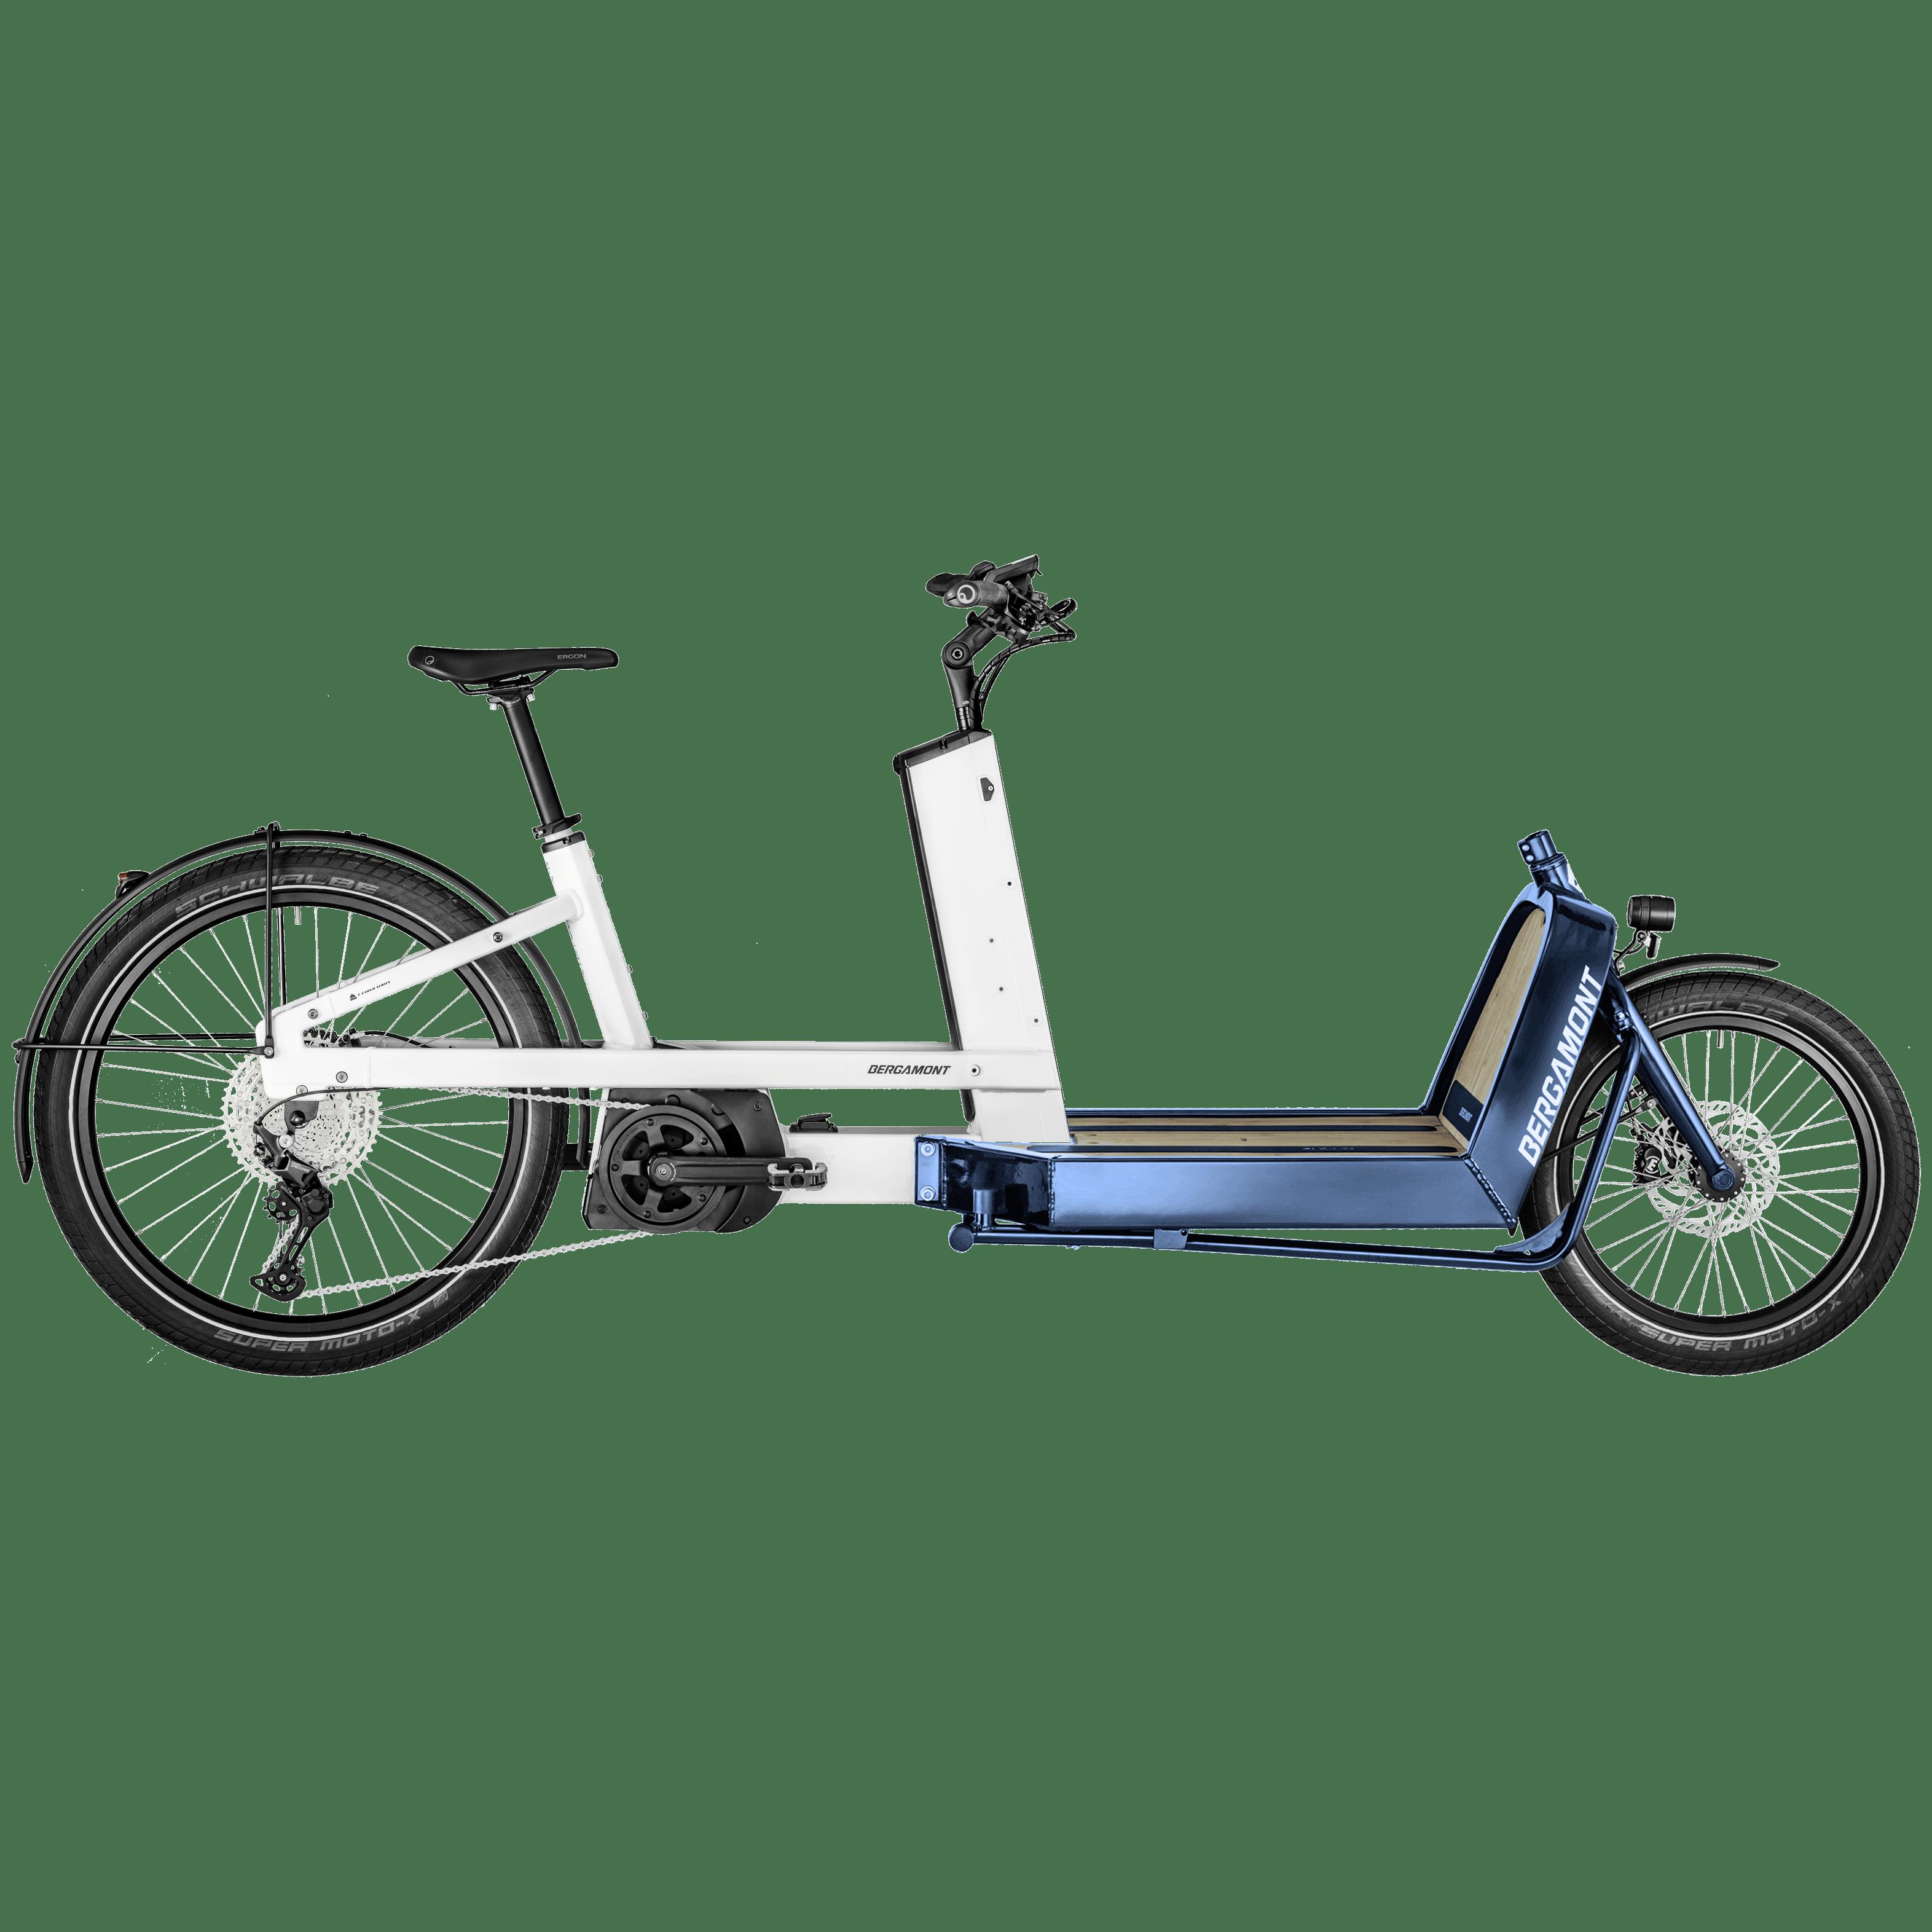 Esprit vélo BERGAMONT E-CARGOVILLE LJ EDITION